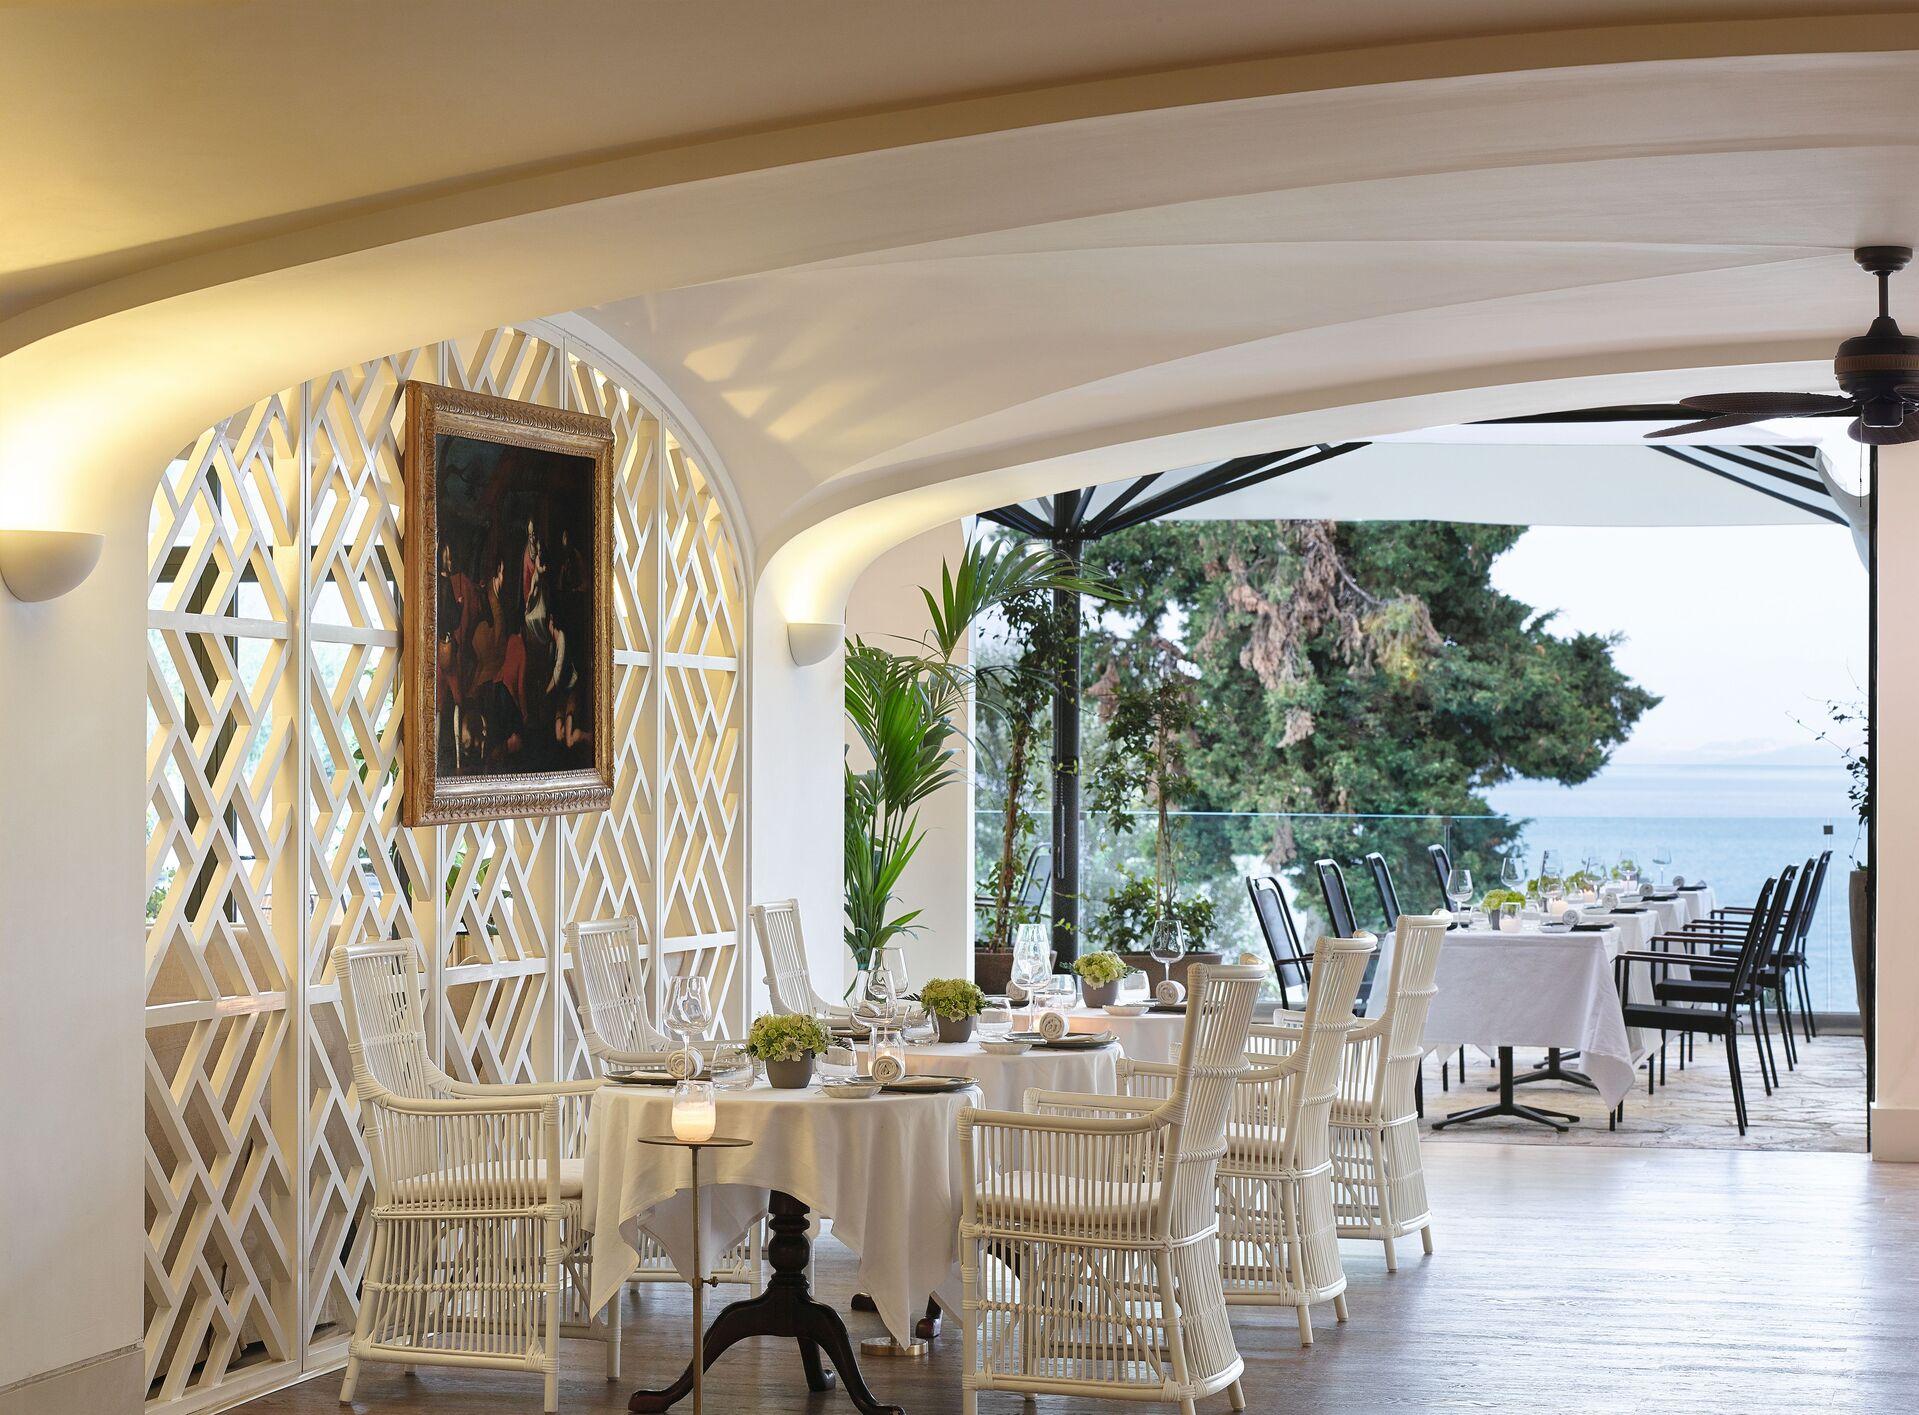 https://cms.satur.sk/data/imgs/tour_image/orig/05-il-gattopardo-restaurant_72dpi-1924848.jpg